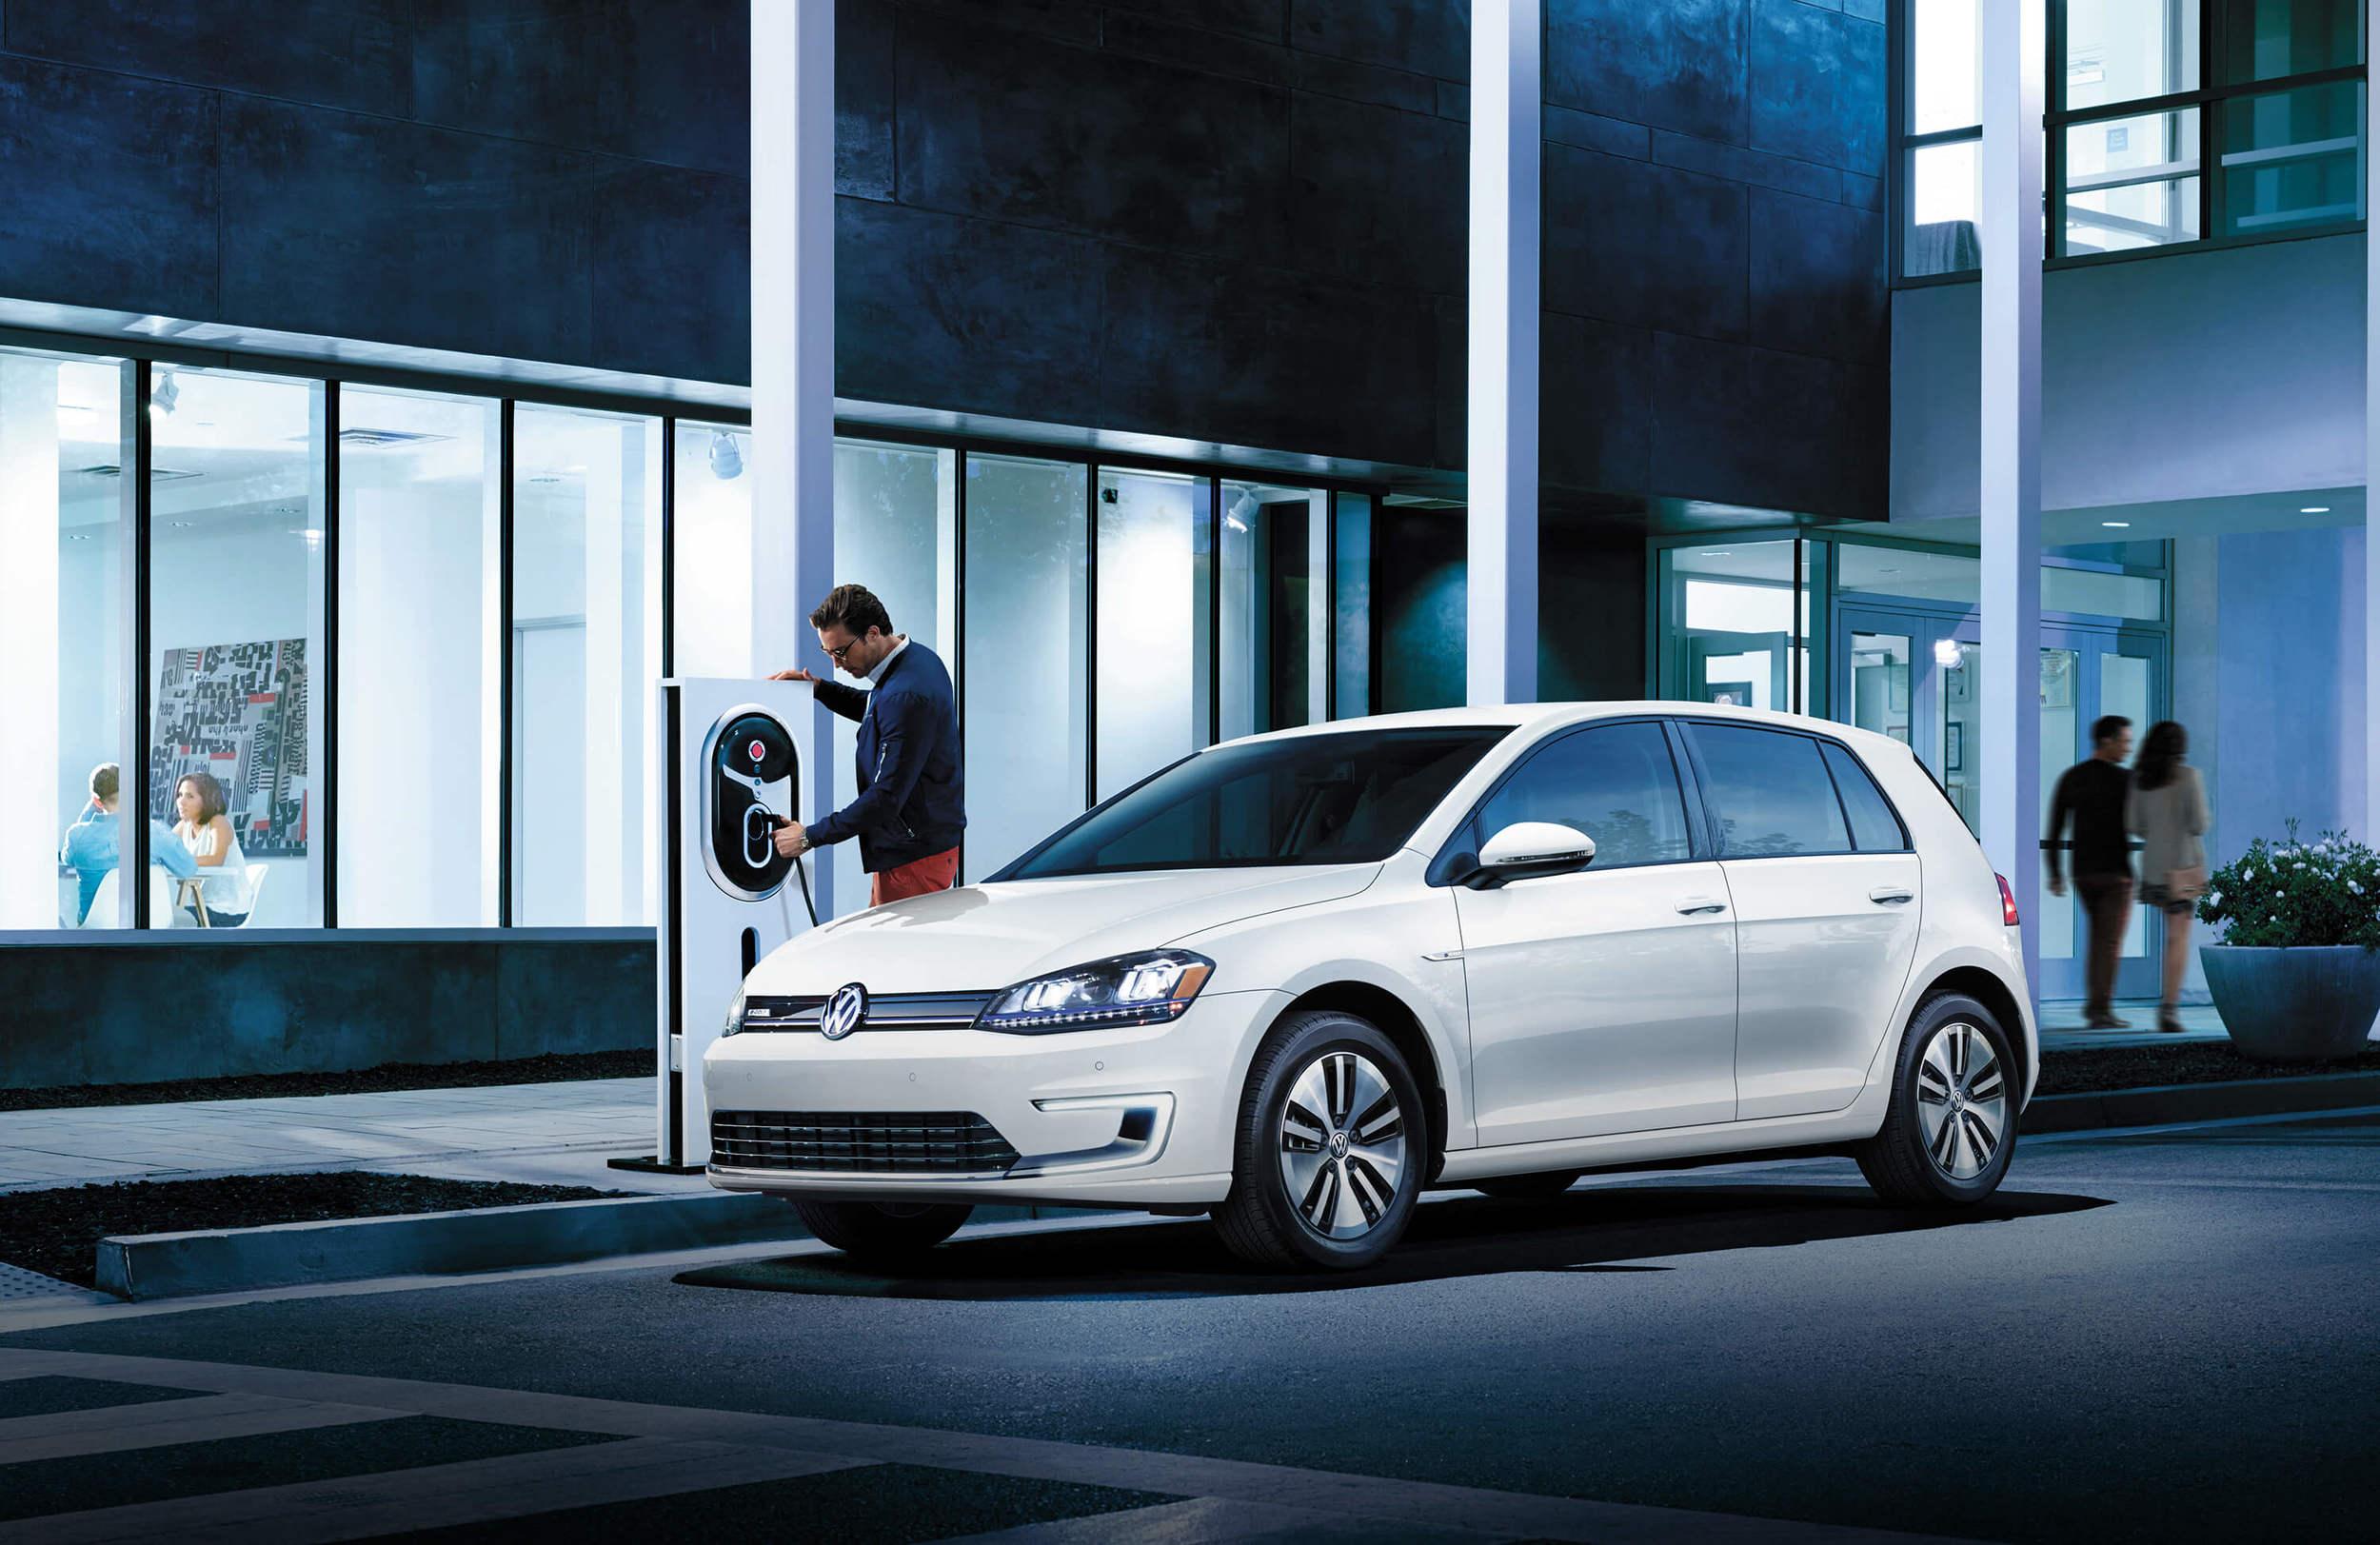 2016 Volkswagen e-Golf SEL (source: vw.com)